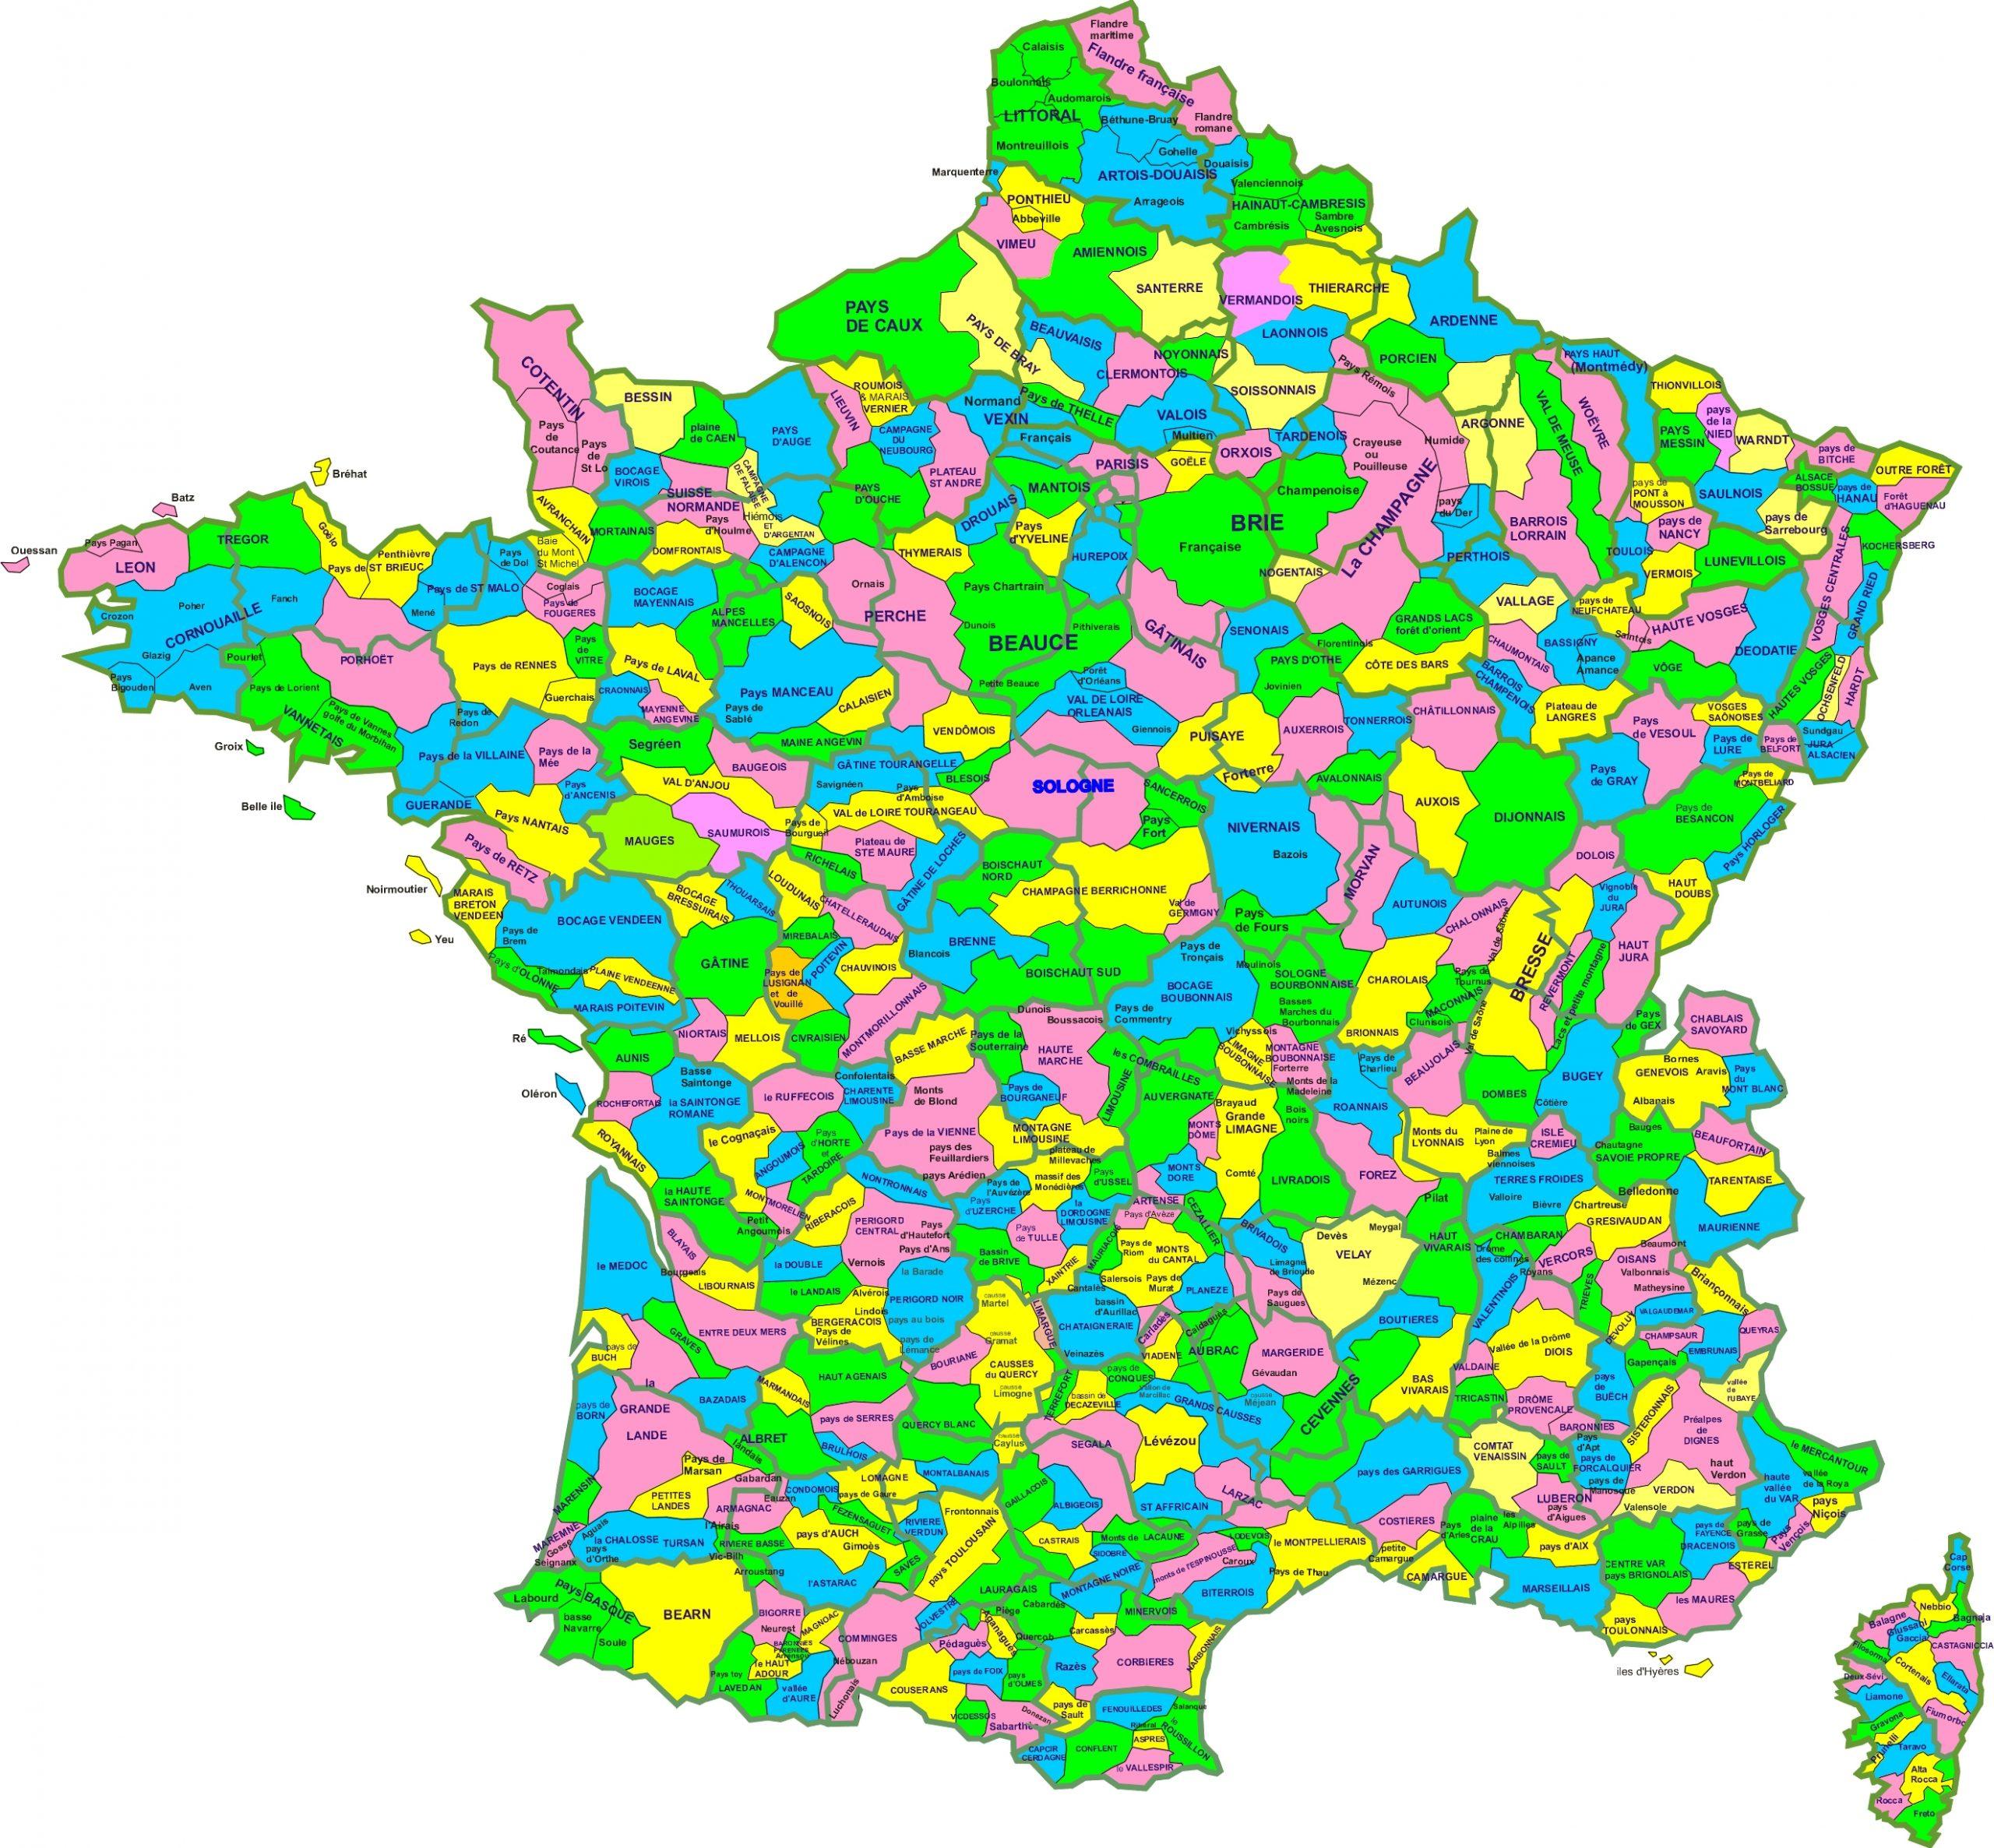 E7125Db Carte France Region | Wiring Resources tout Map De France Regions